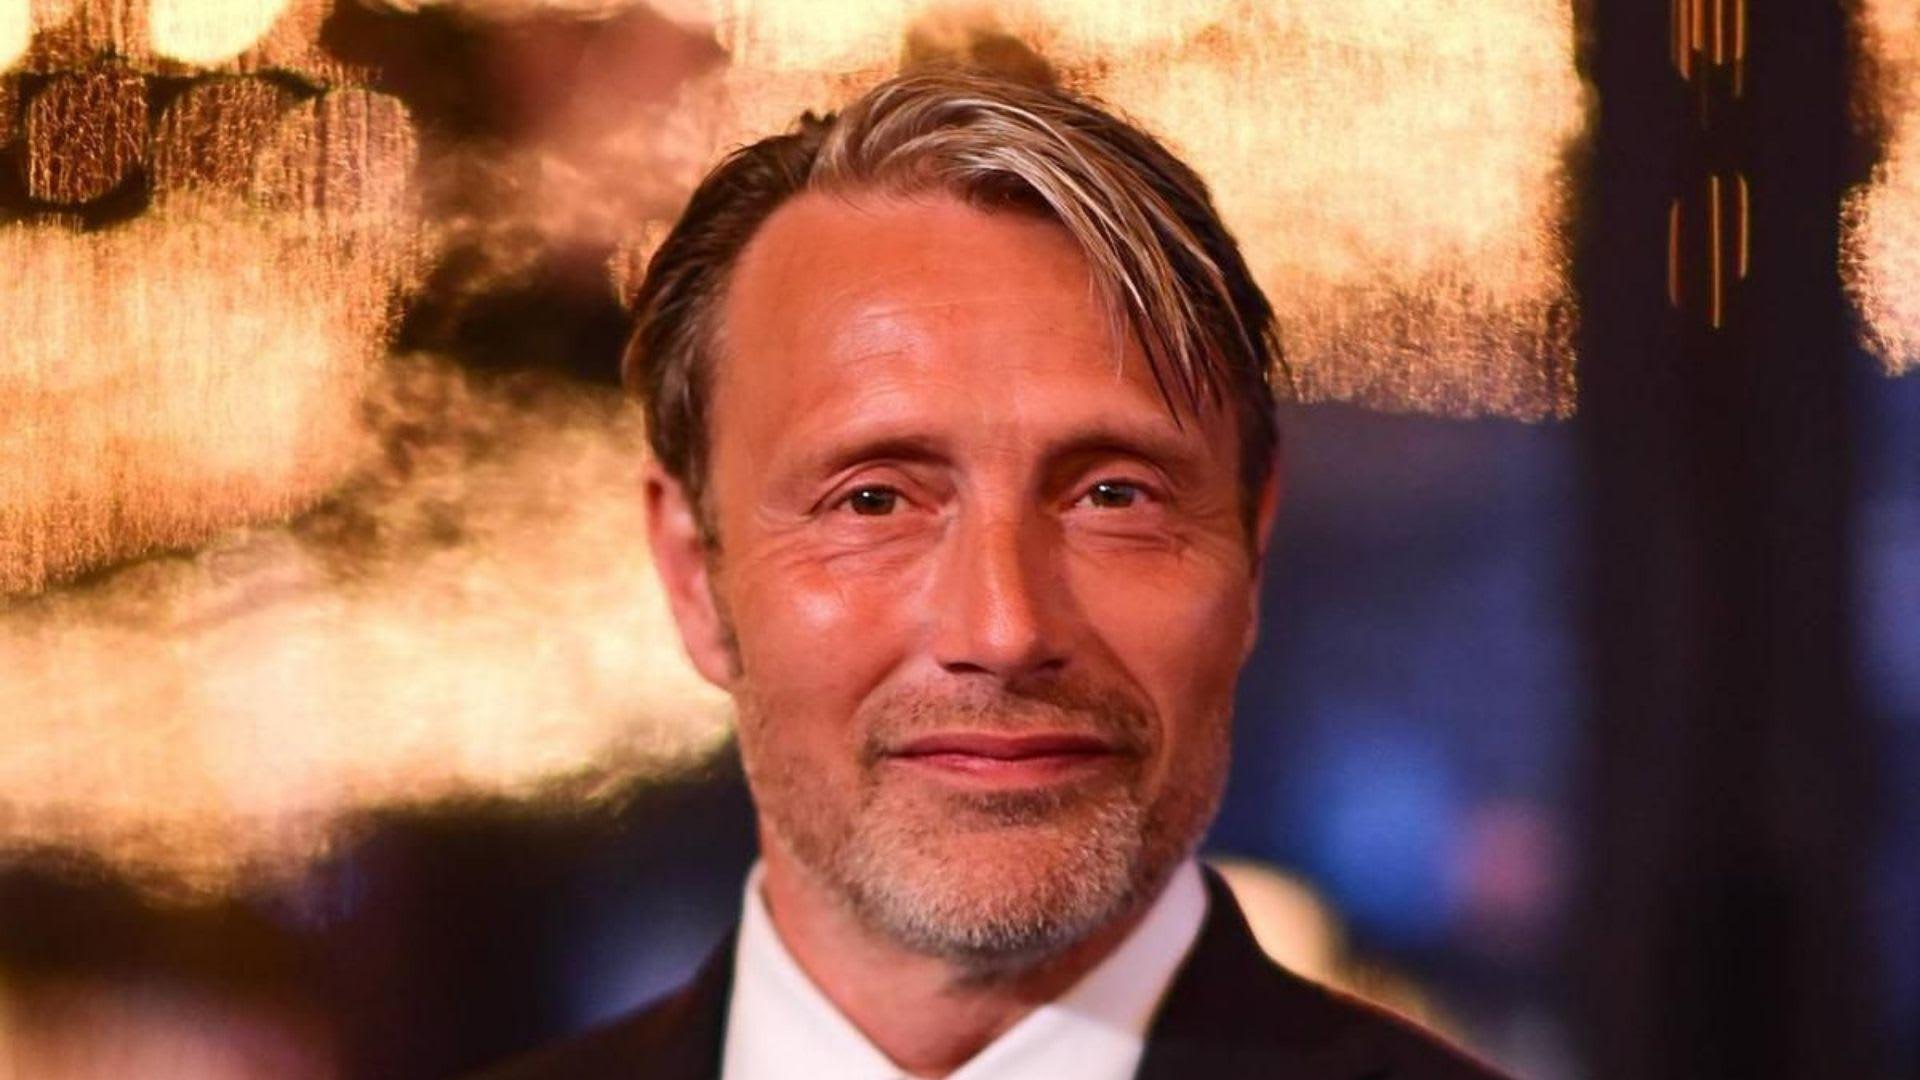 Chi è Mads Mikkelsen prima del ruolo di Grindelwald?